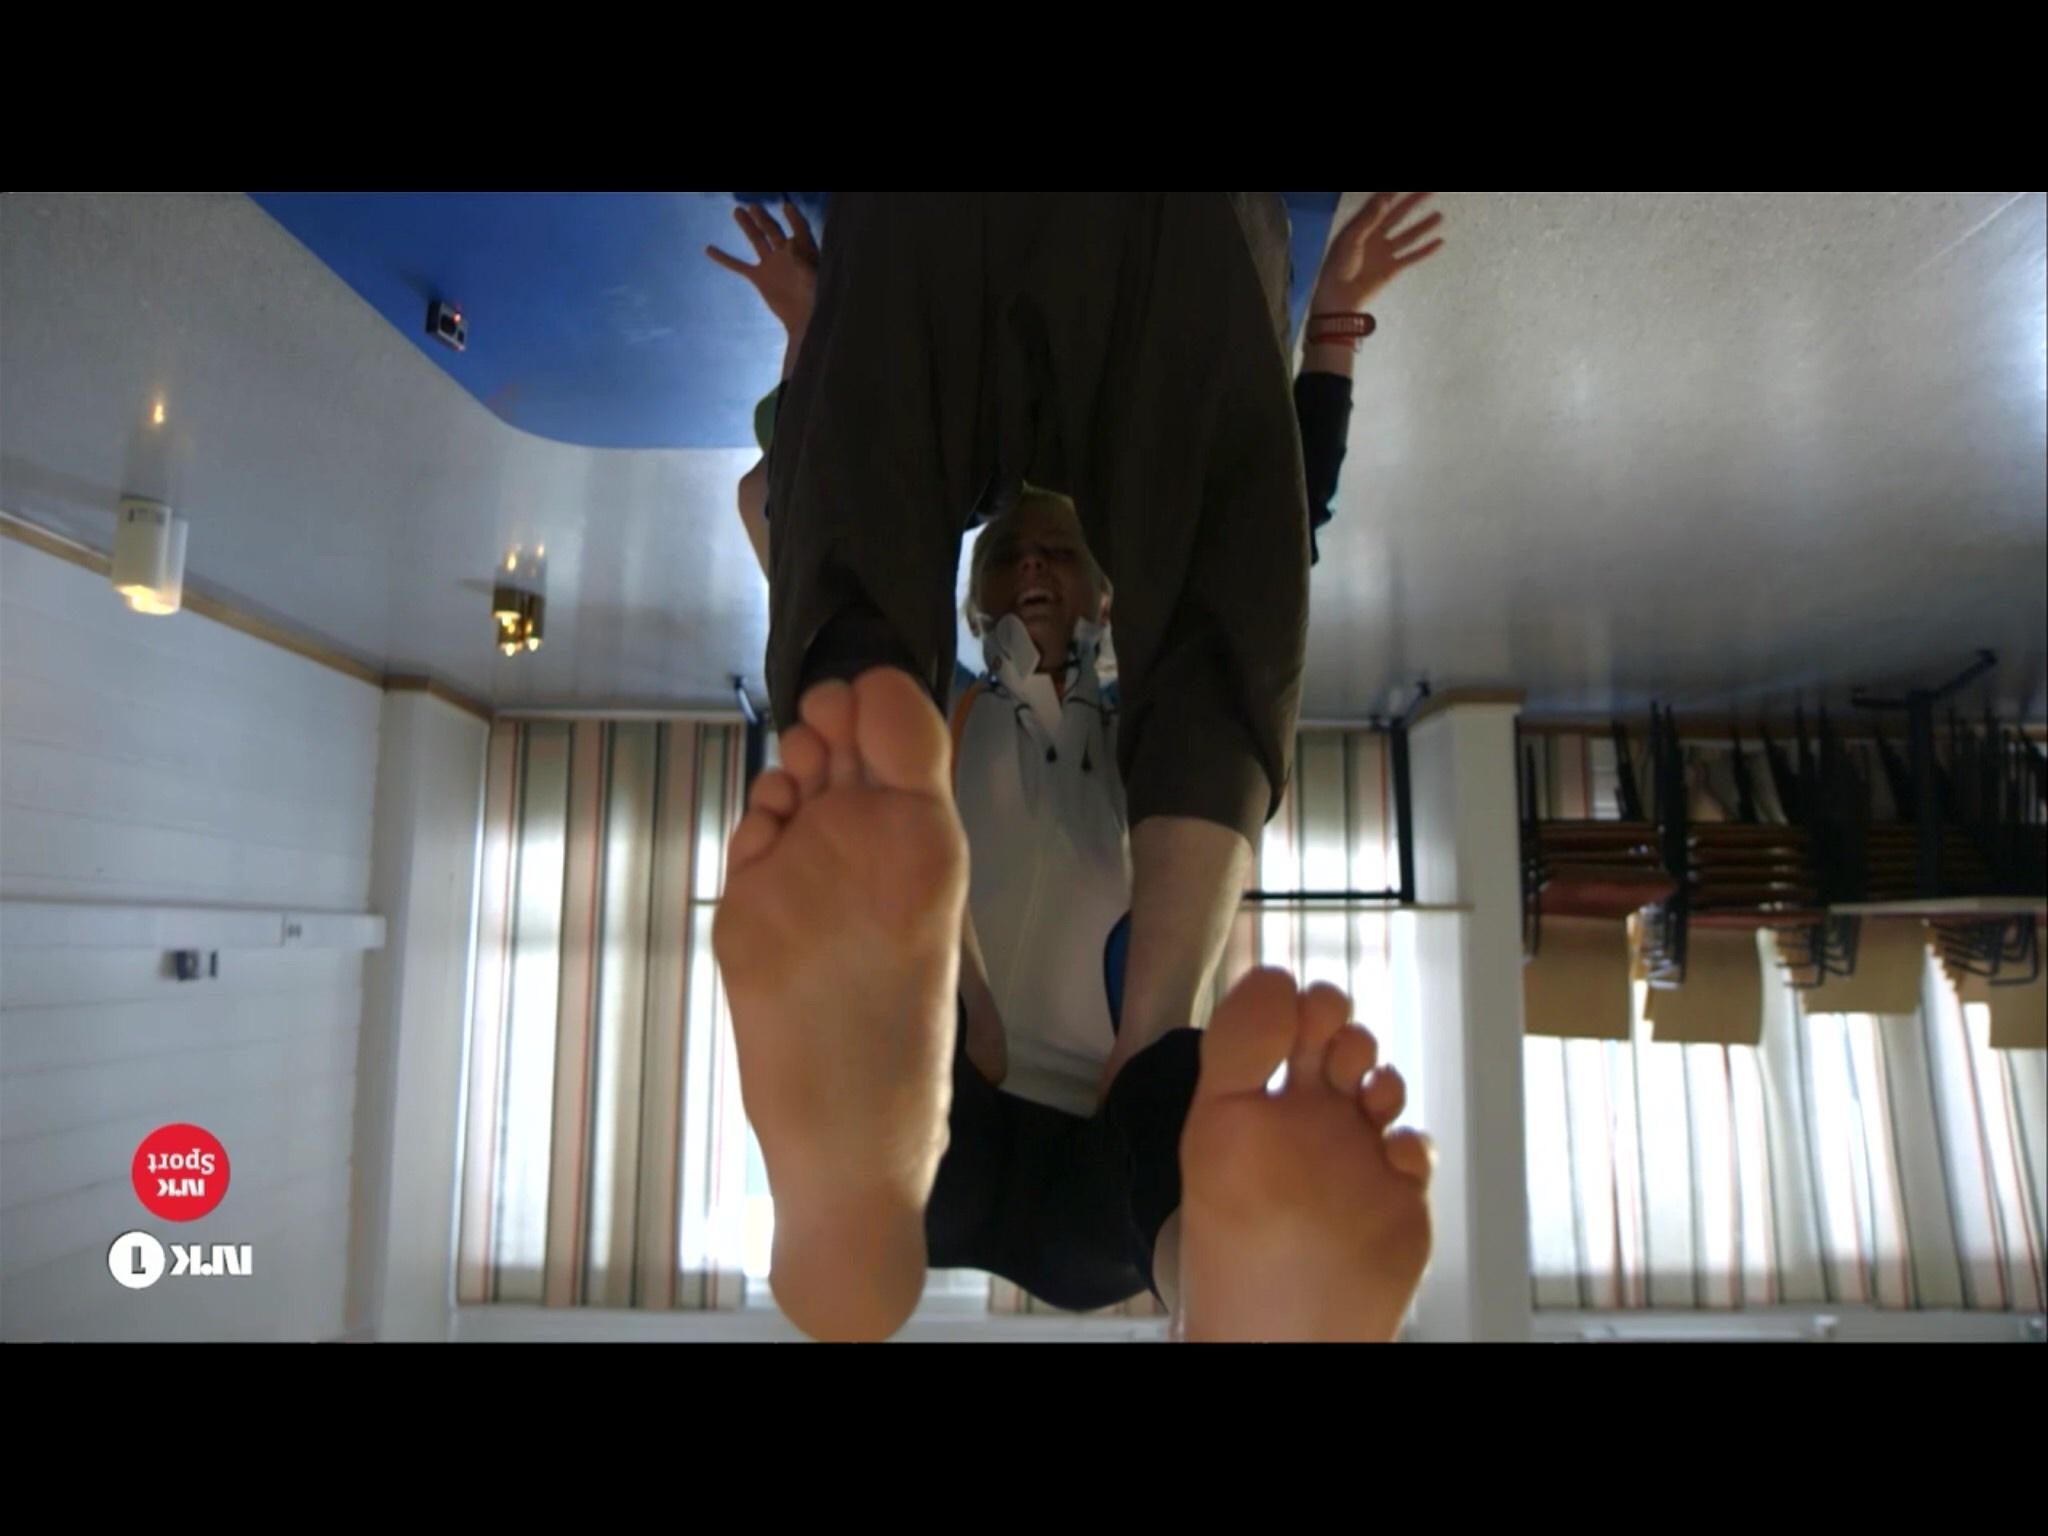 Therese johaug feet